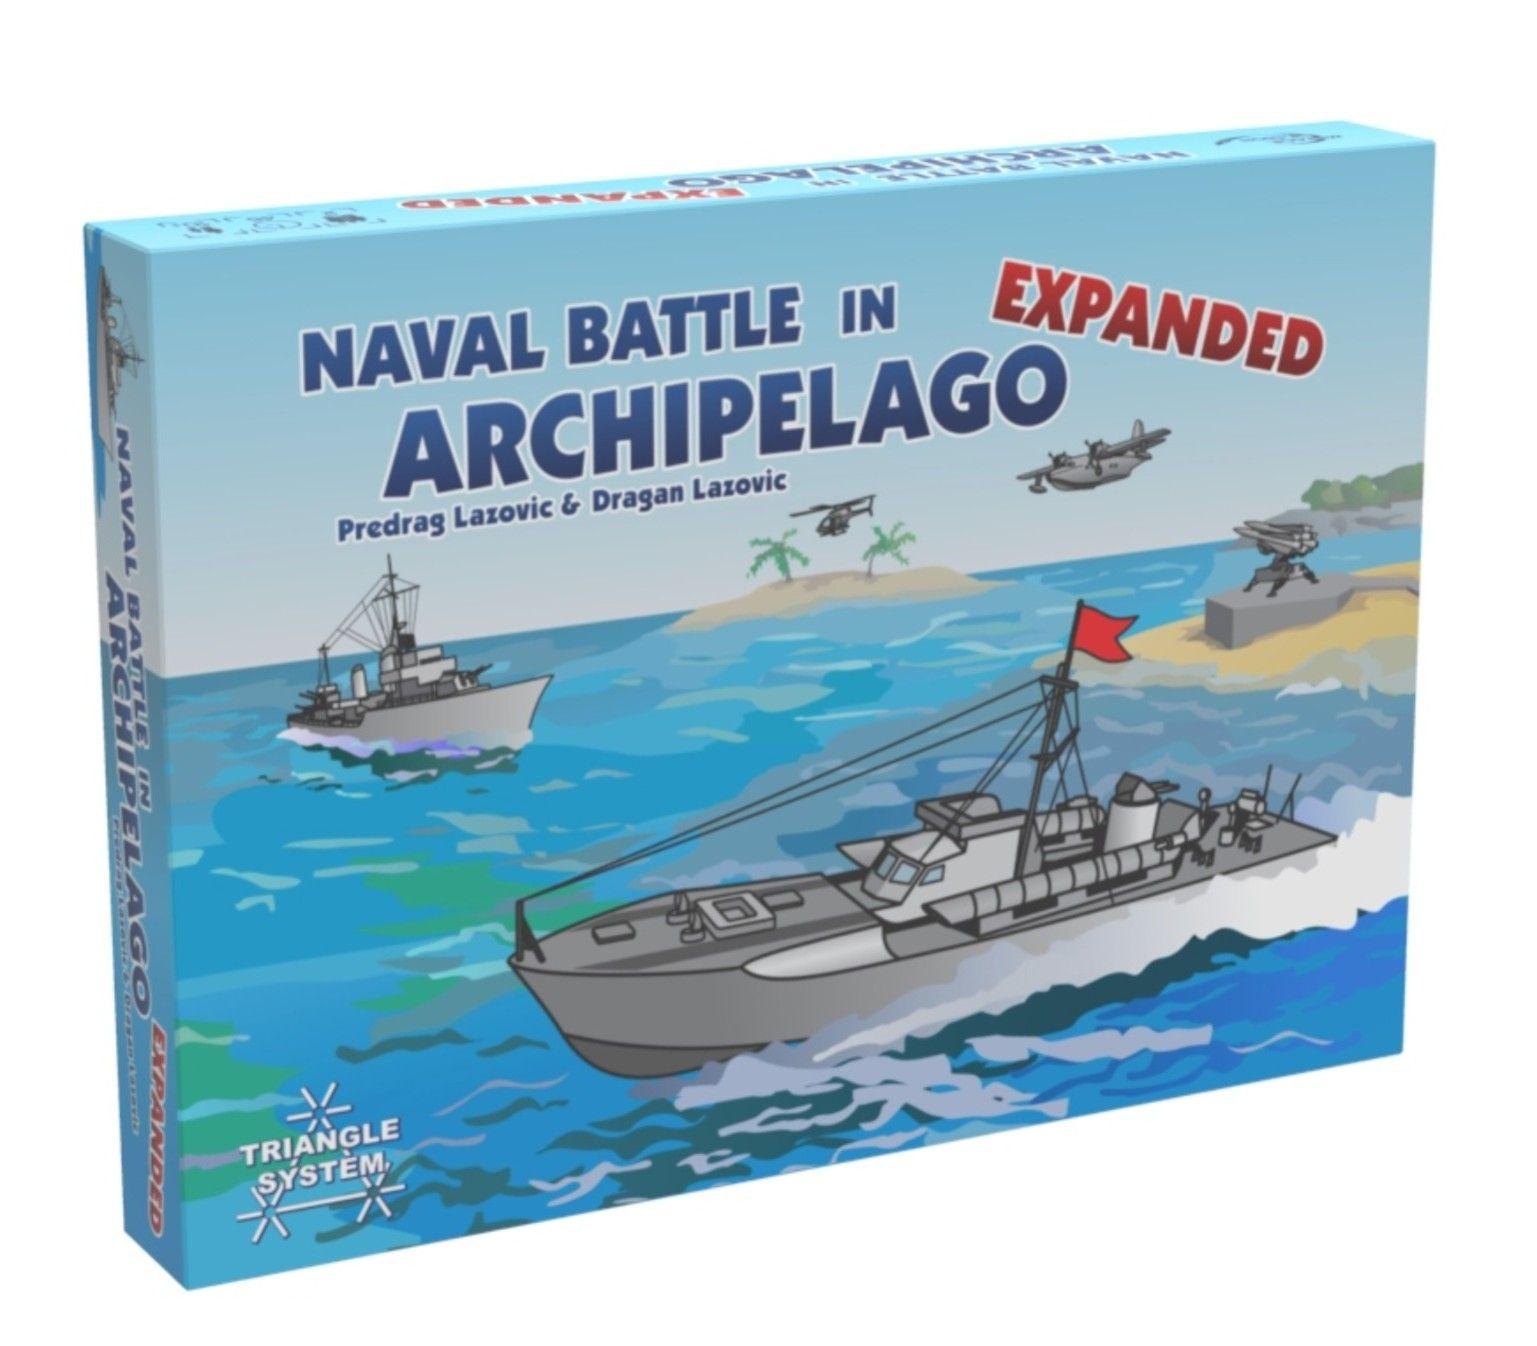 Naval Battle in Archipelago